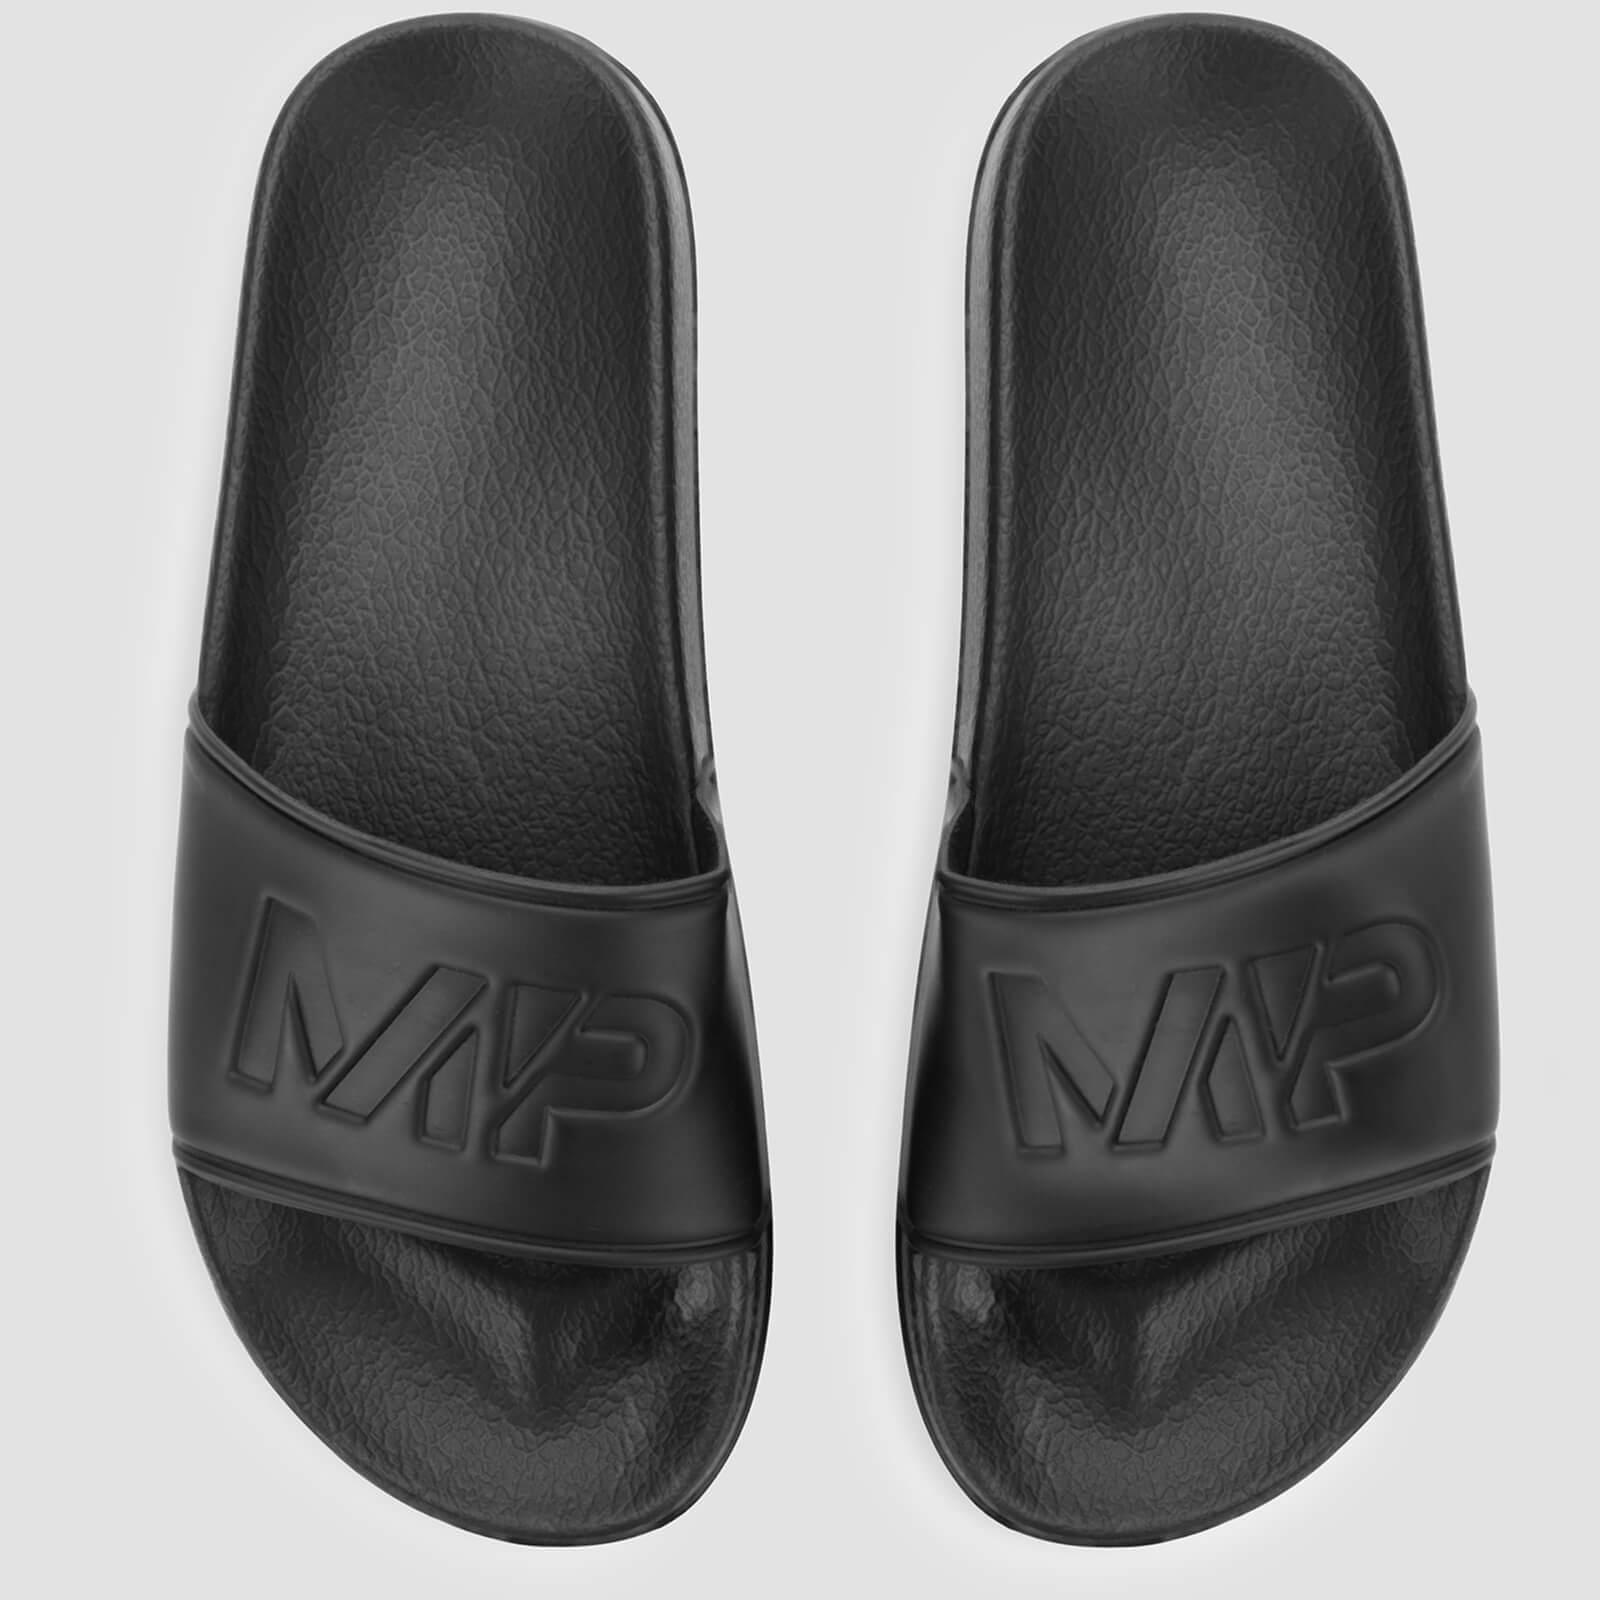 Myprotein MP Men's Sliders - Black - UK 11